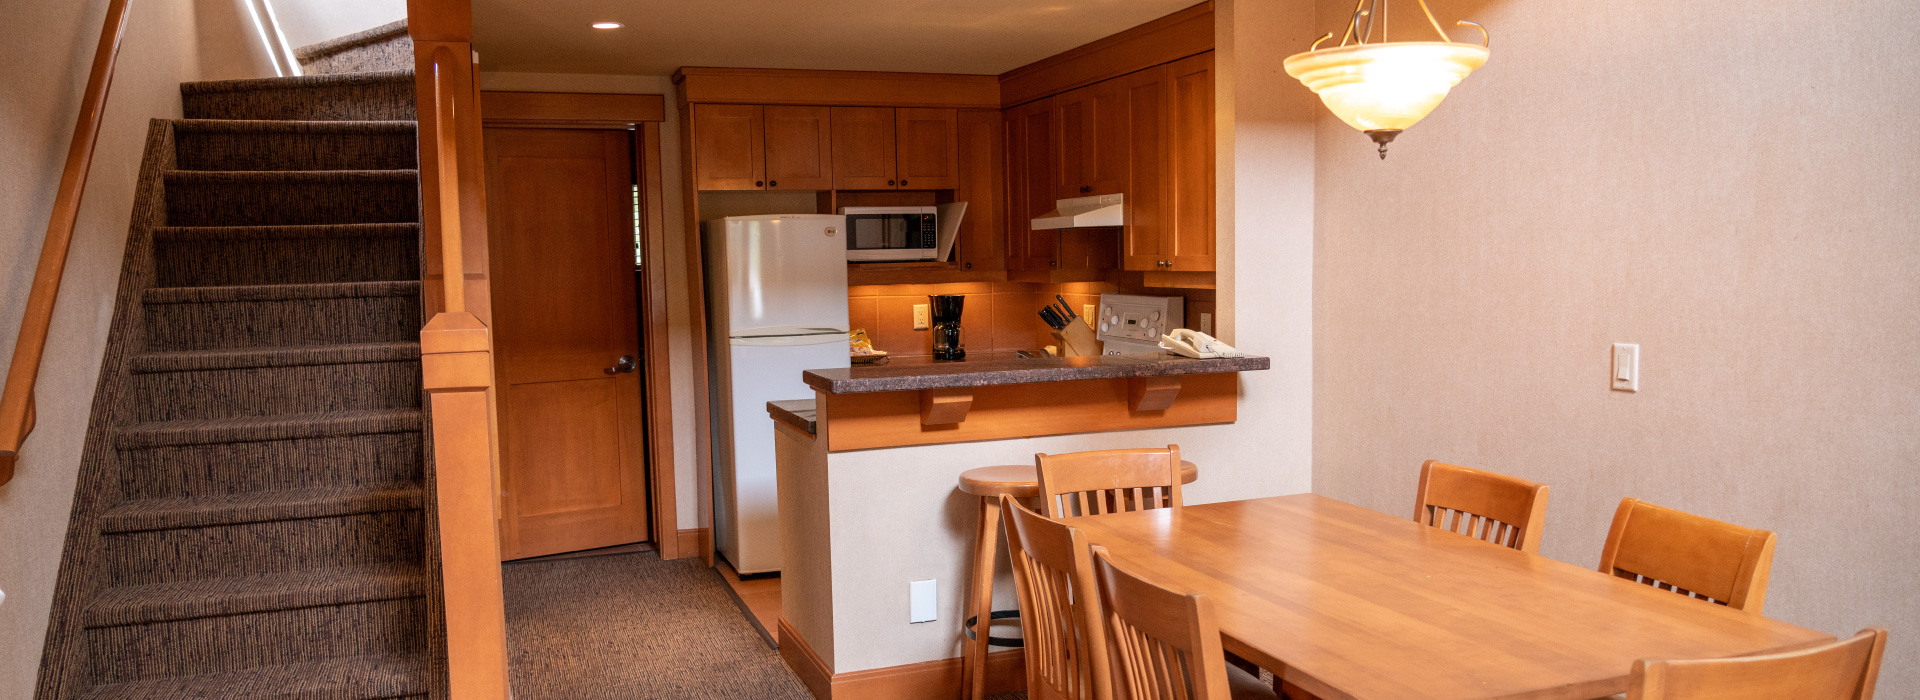 Premier Two Bedroom Loft Condo 4Q